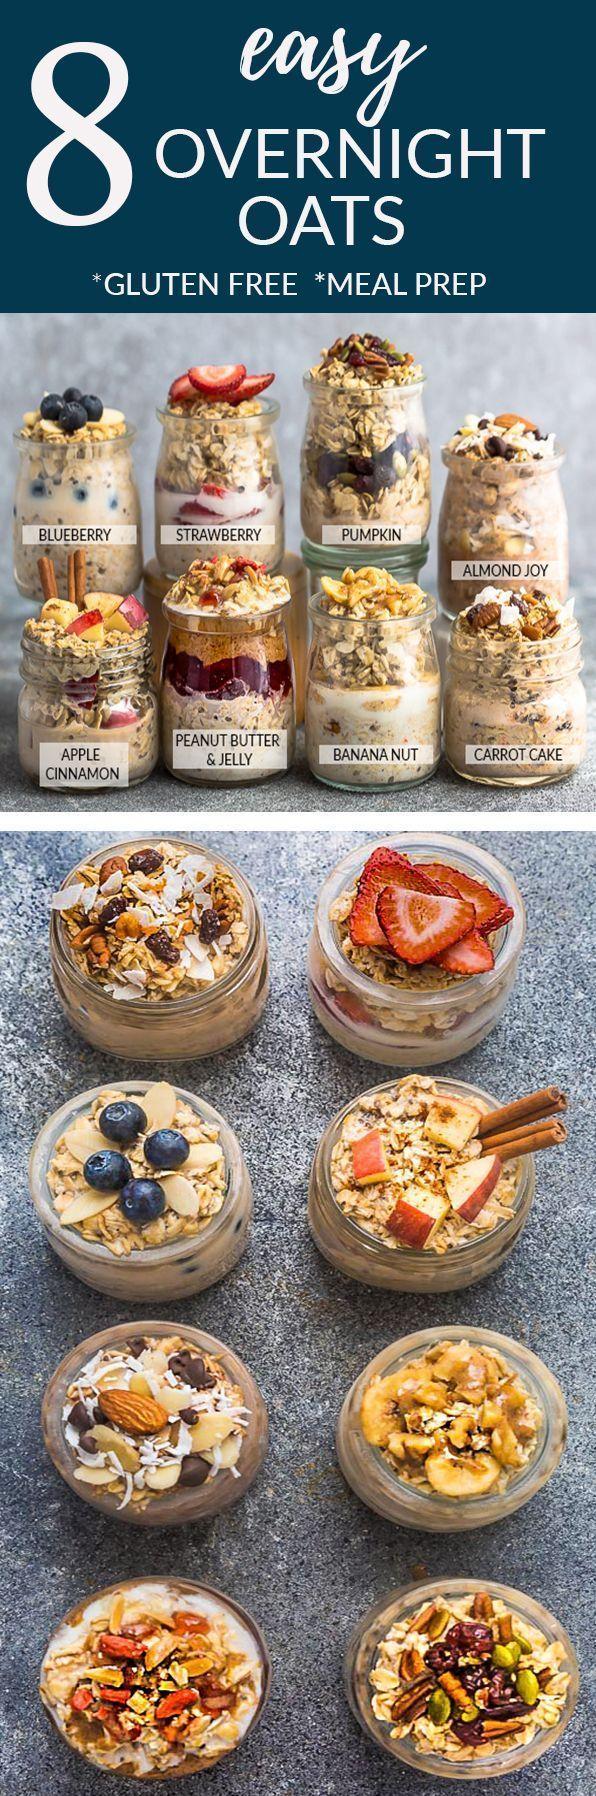 Photo of Overnight Oats – 9 Rezepte + Tipps für das BEST Easy Meal Prep Breakfast